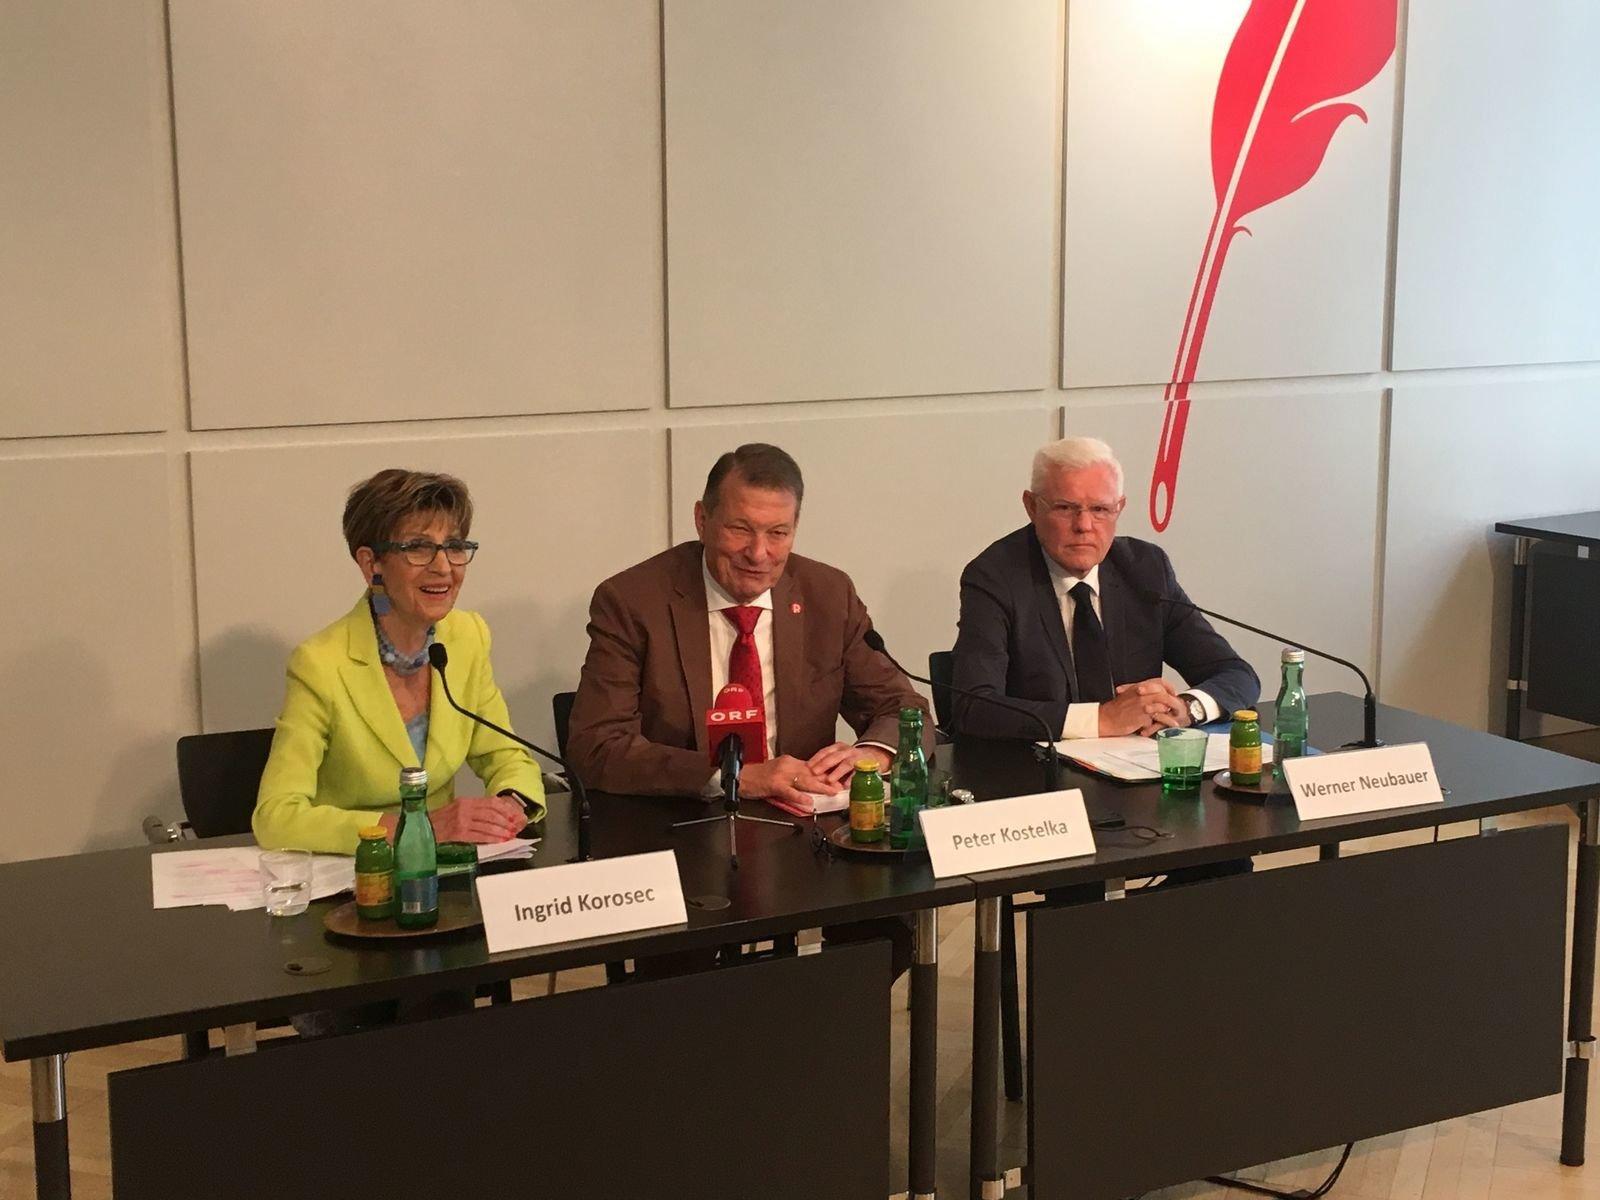 19.09.12 Rapp. pensionati. Ingrid Korosec (Övp), Peter Kostelka (Spo), Werner Neubauer (Fpo)